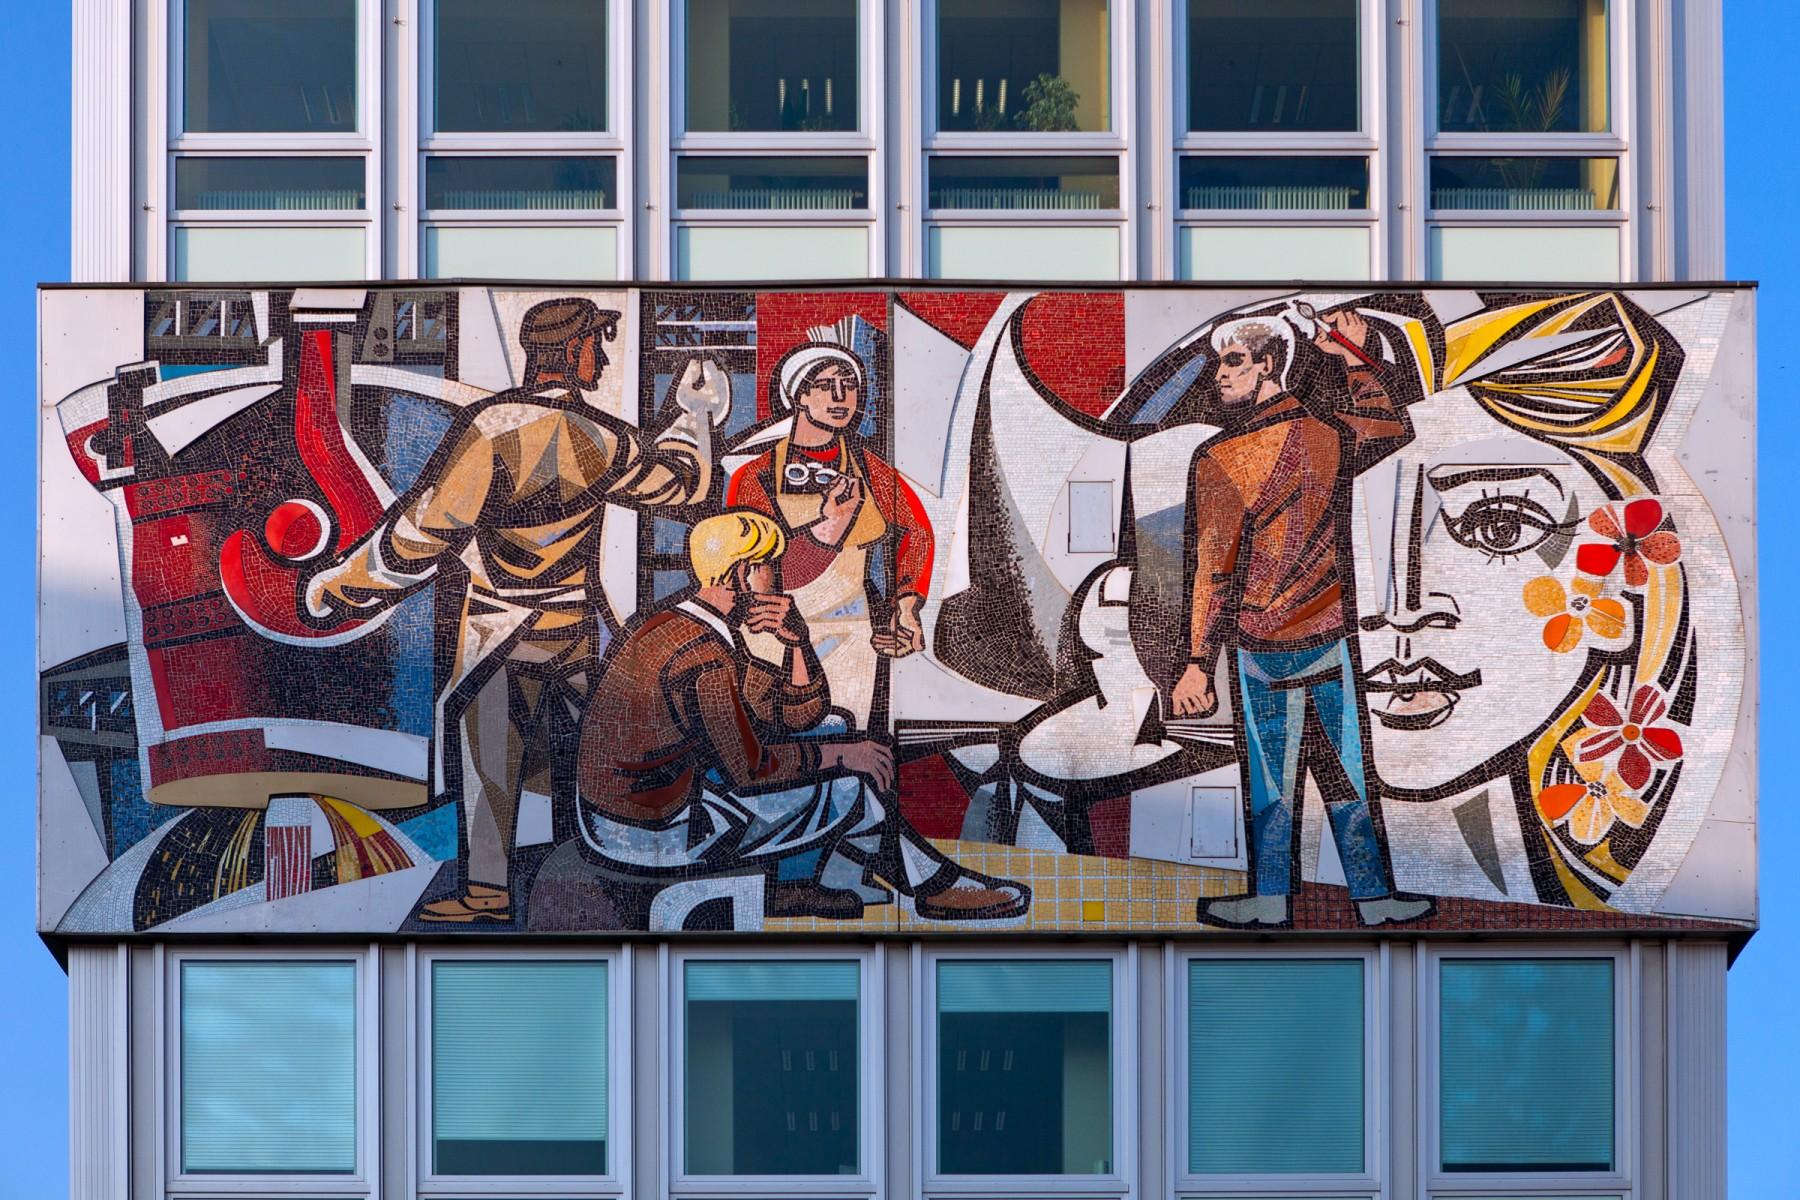 Haus des Lehrers mural